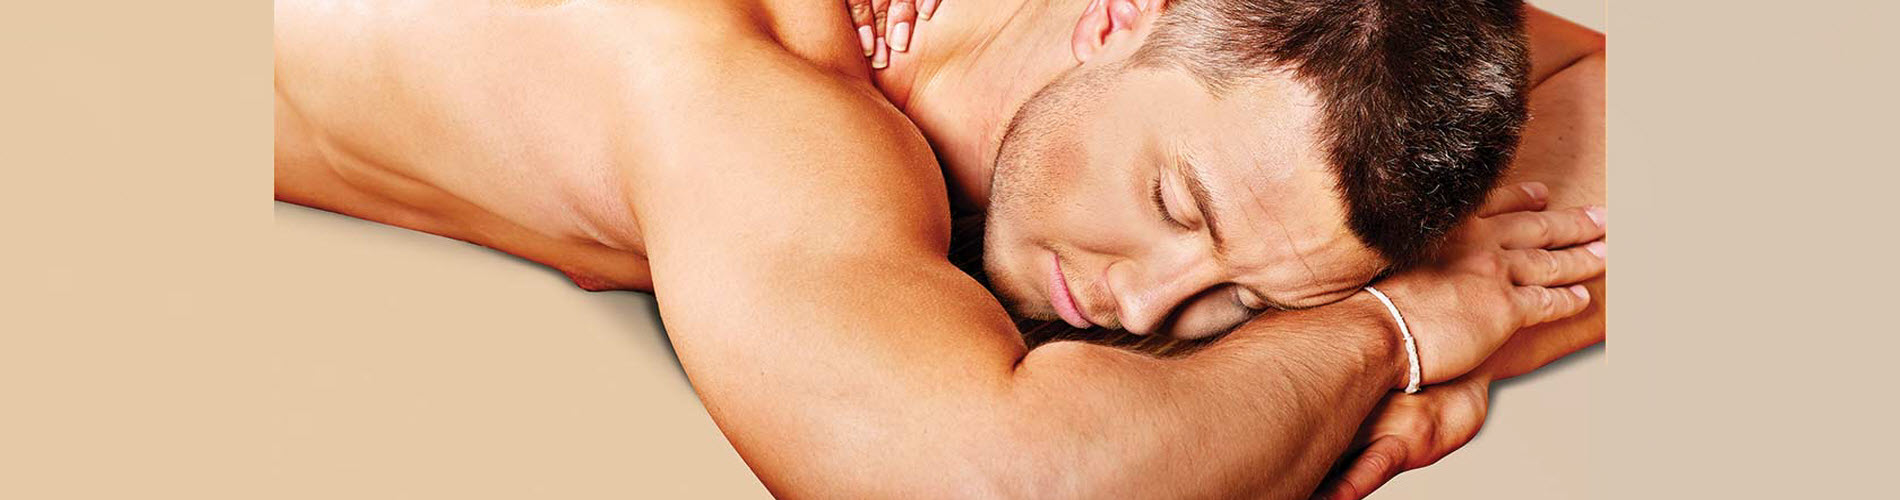 Sports massage sherman oaks